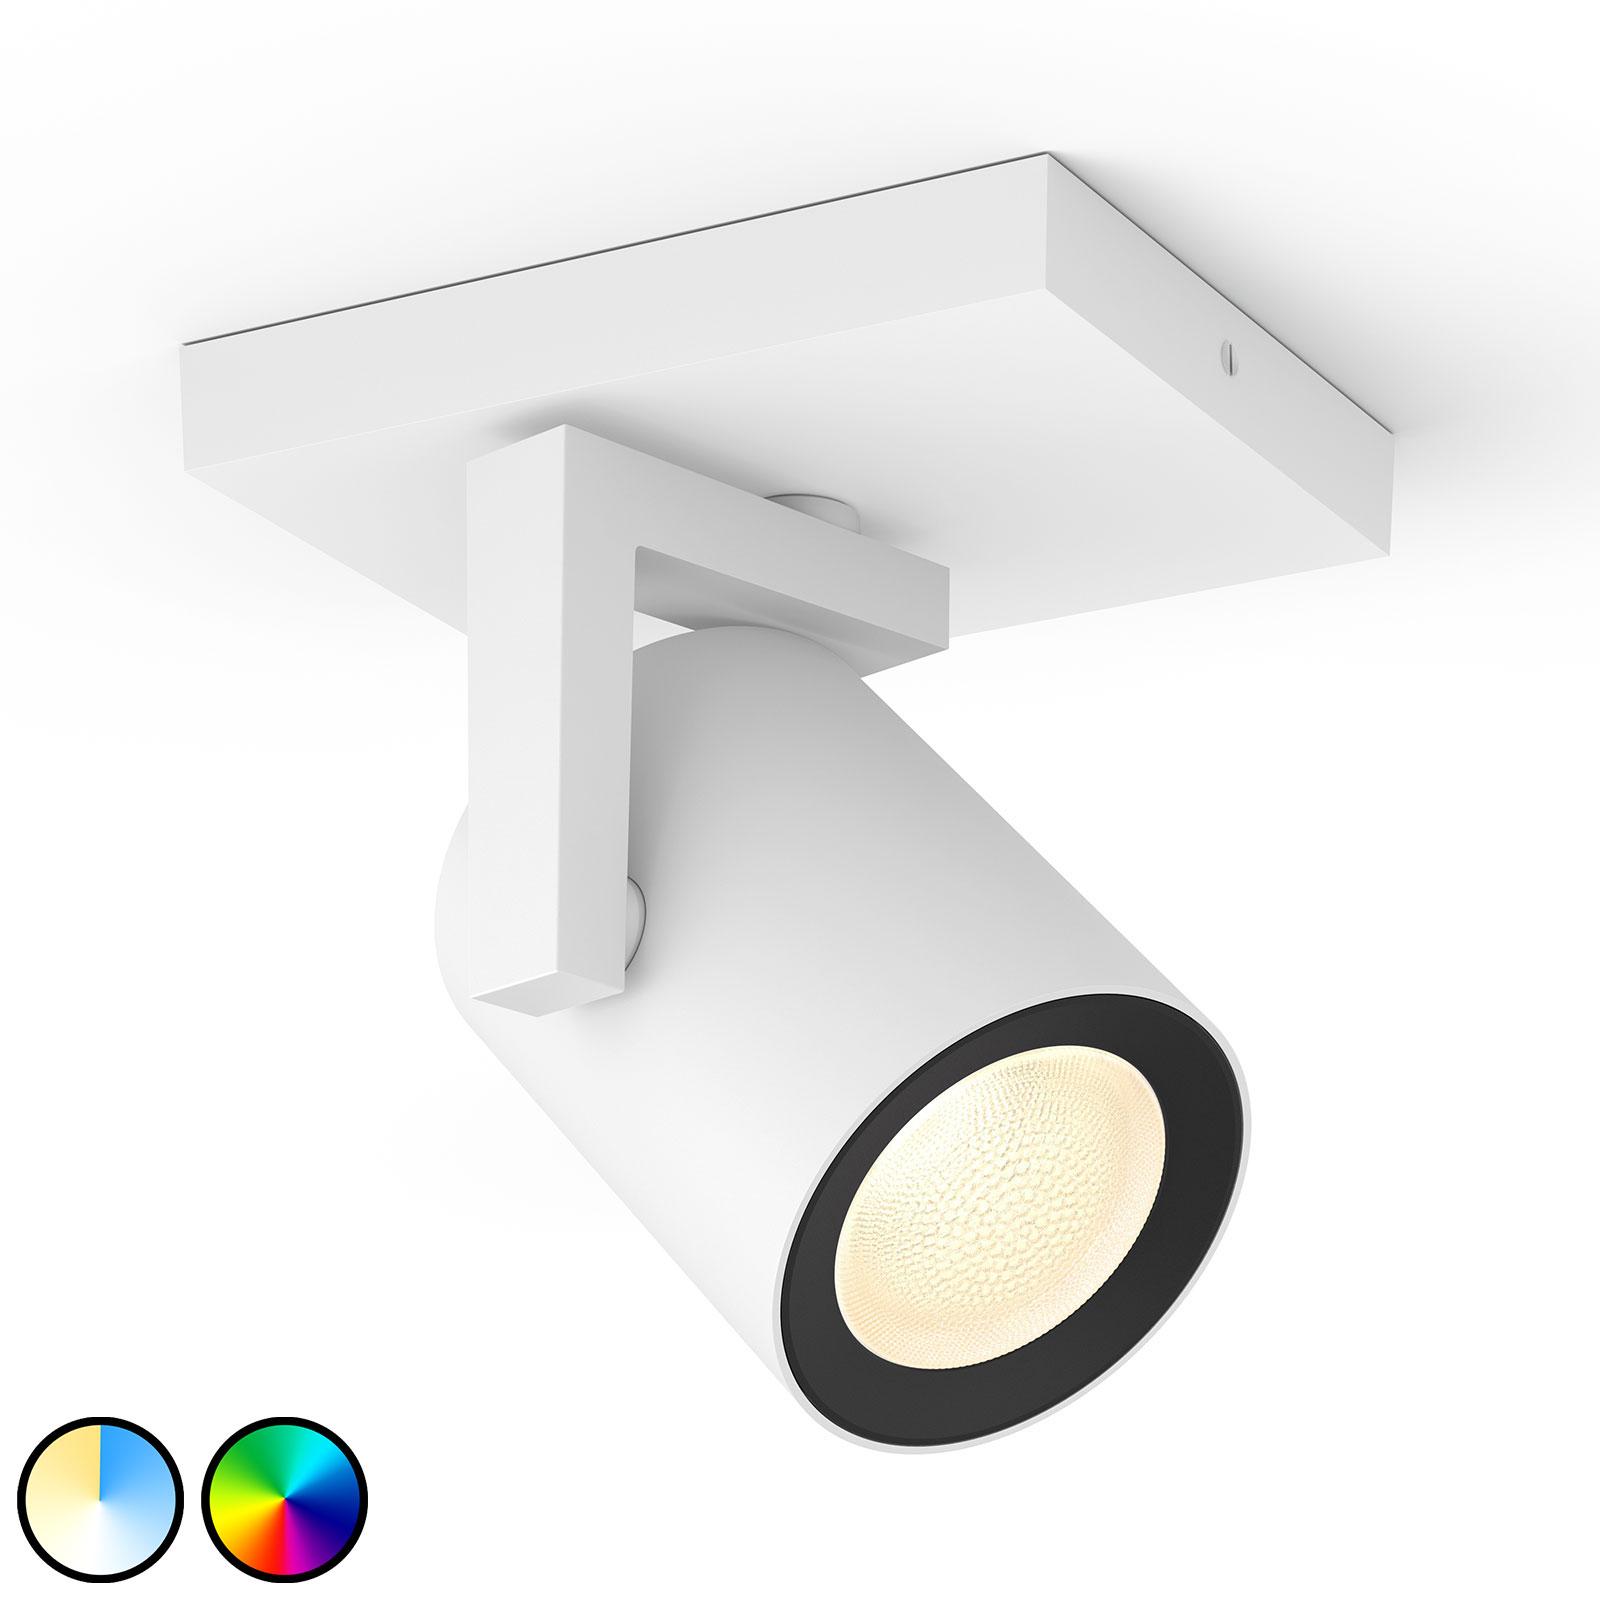 Philips Hue Argenta LED-Spot einflammig weiß